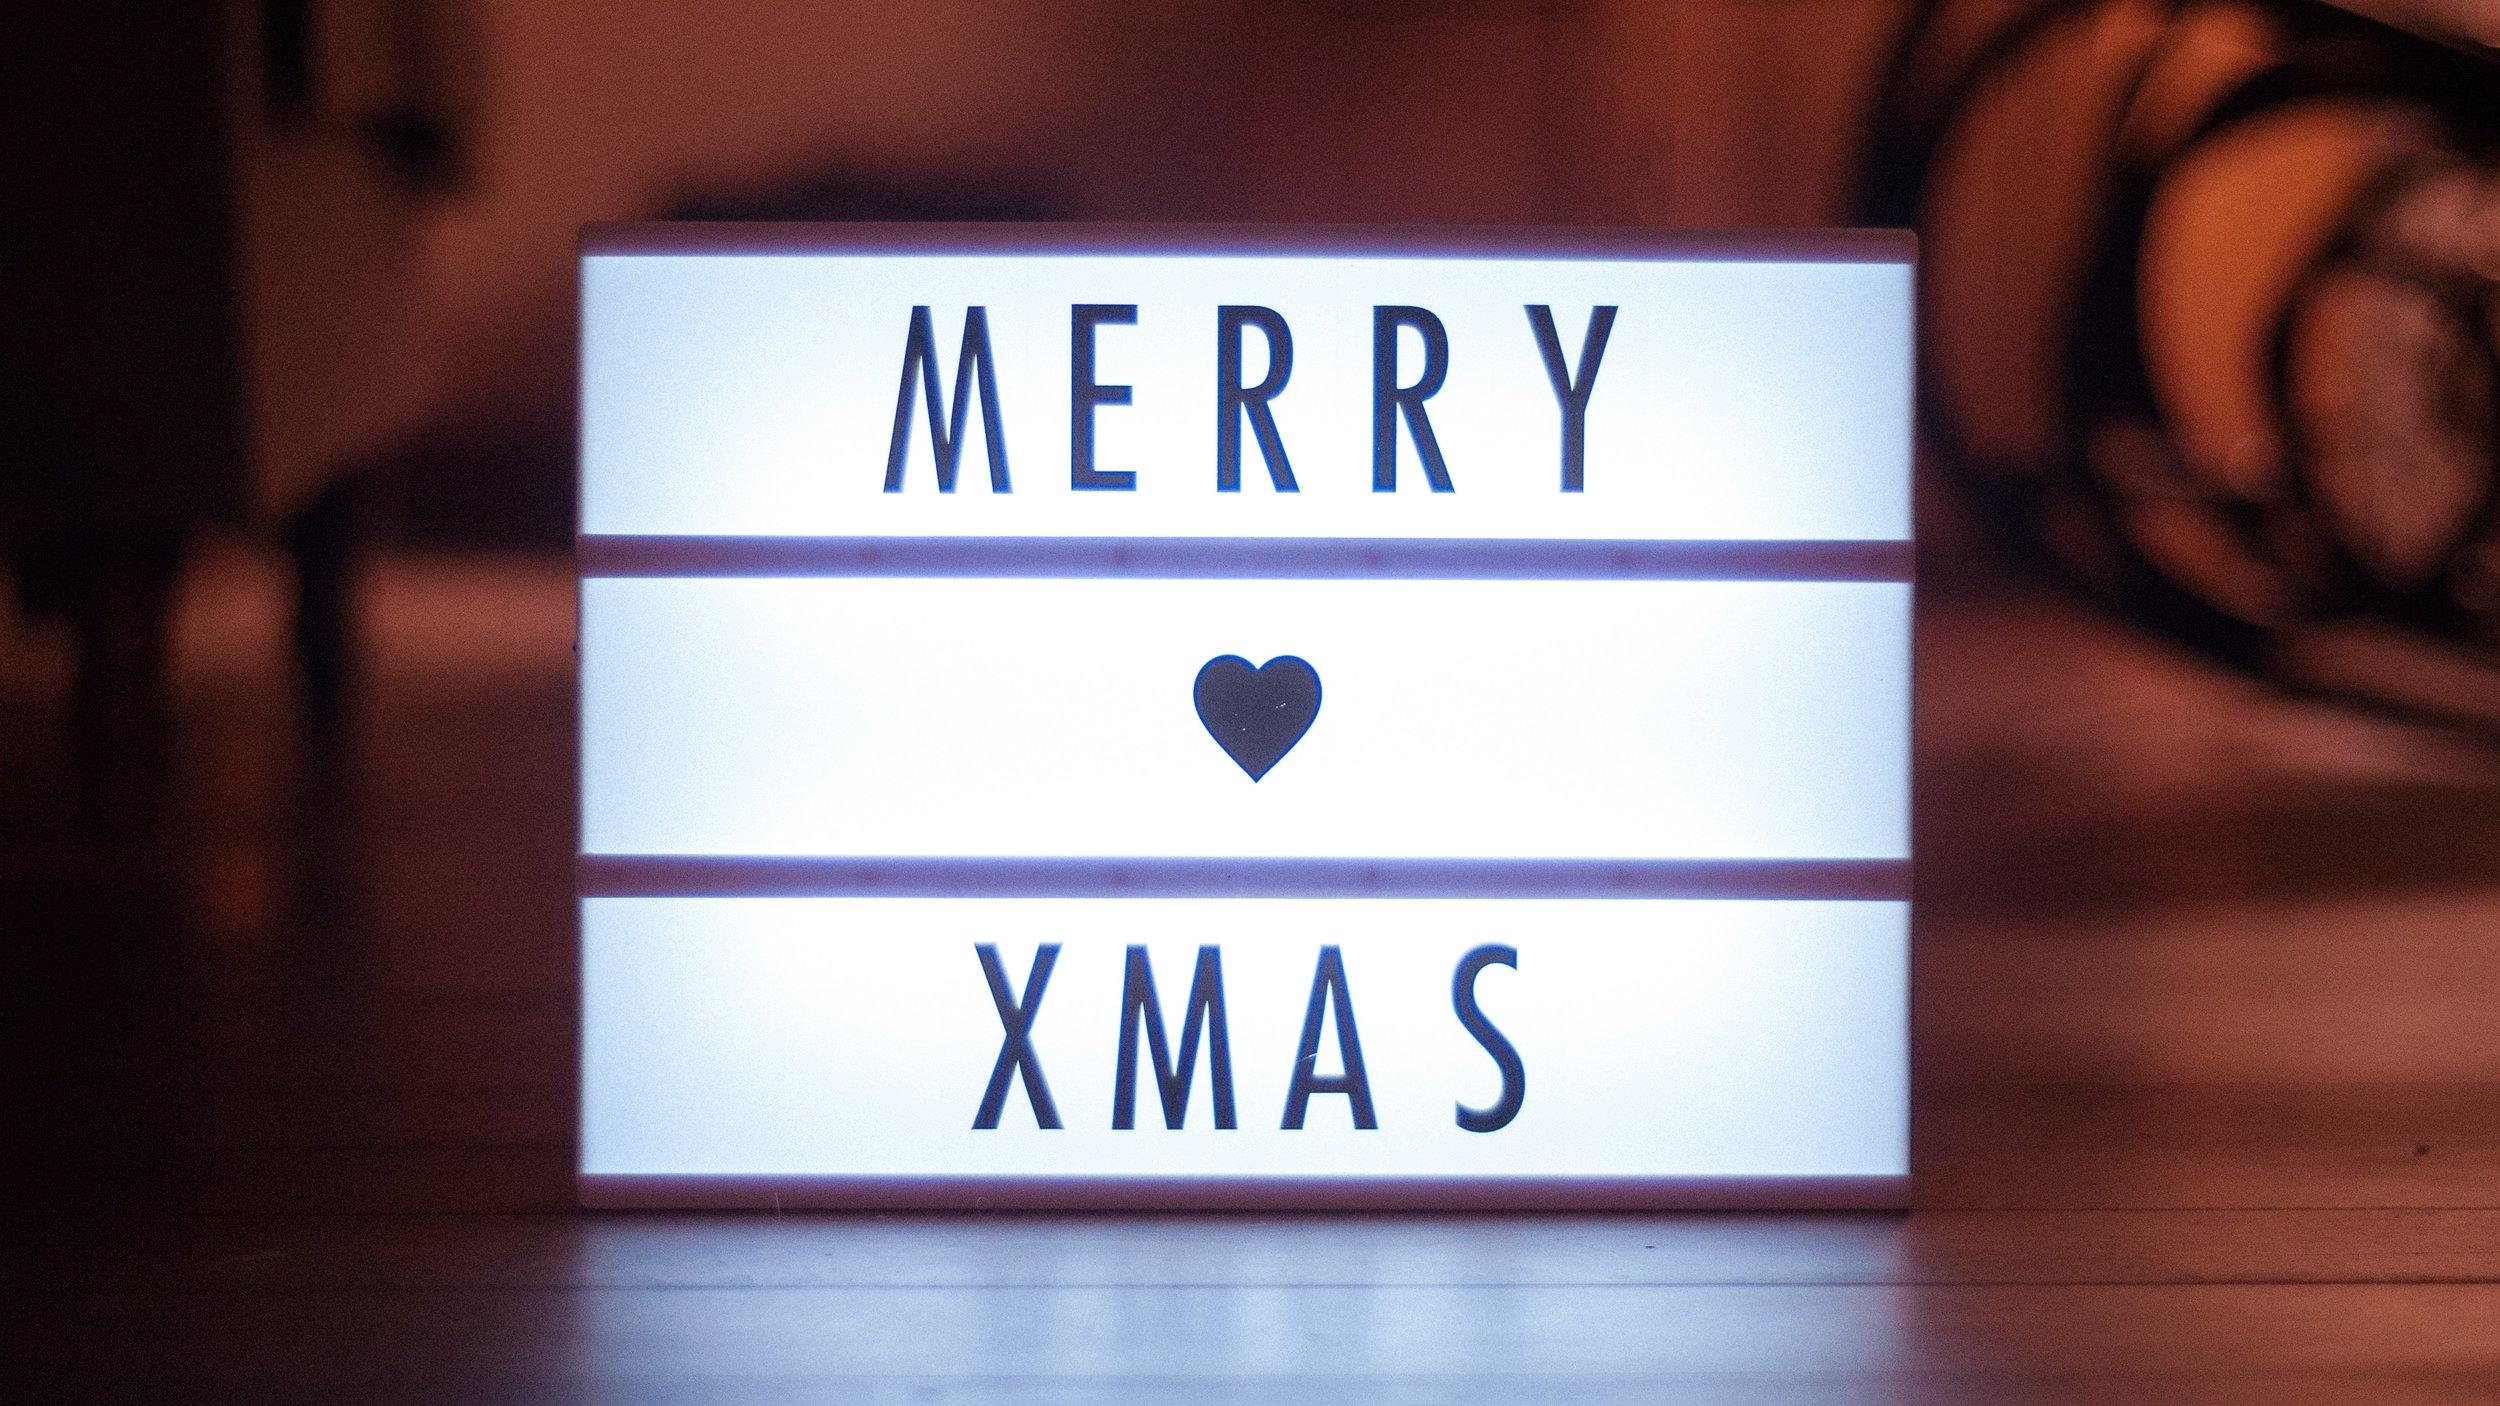 Merry Xmas from Eureka Springs